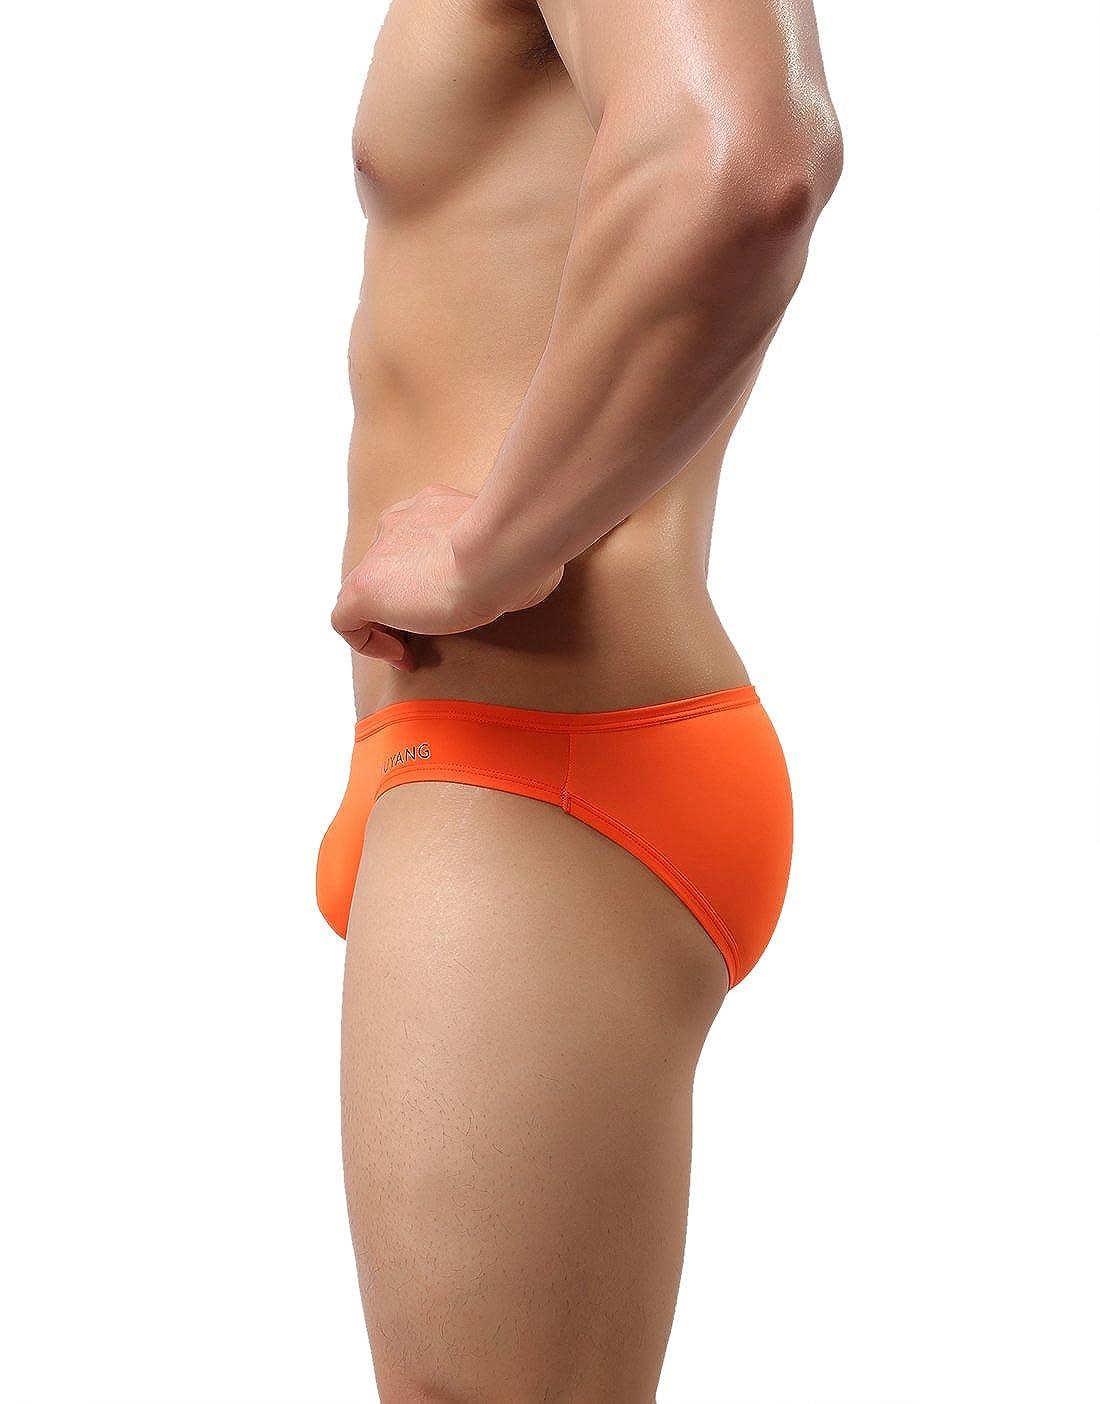 WOWHOM Mens Bikini Briefs Sport Underwear 9017